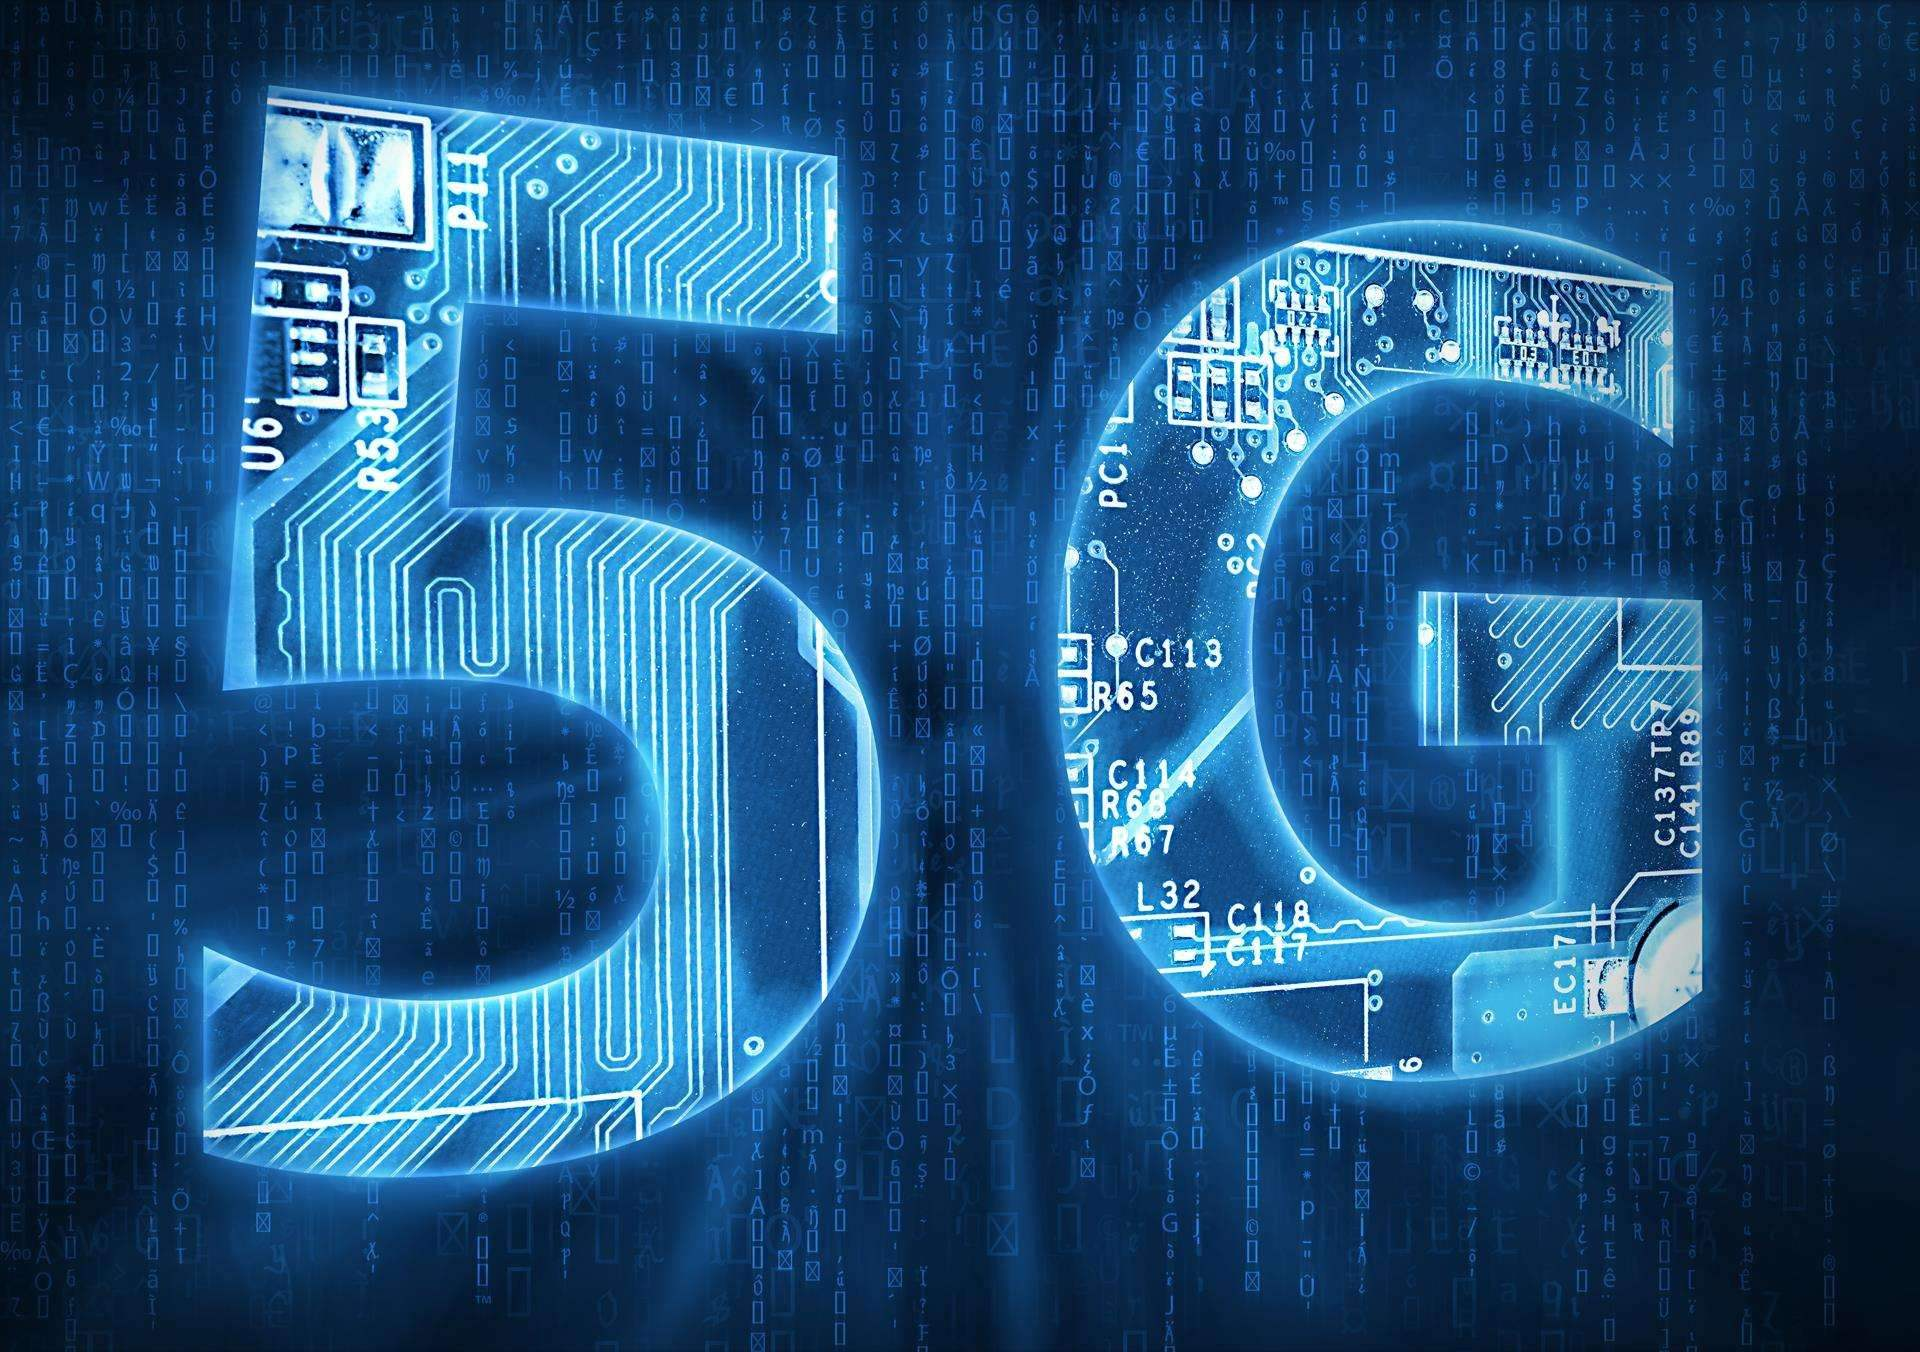 AGV机器人搭配5G,将产生怎样的火花呢?